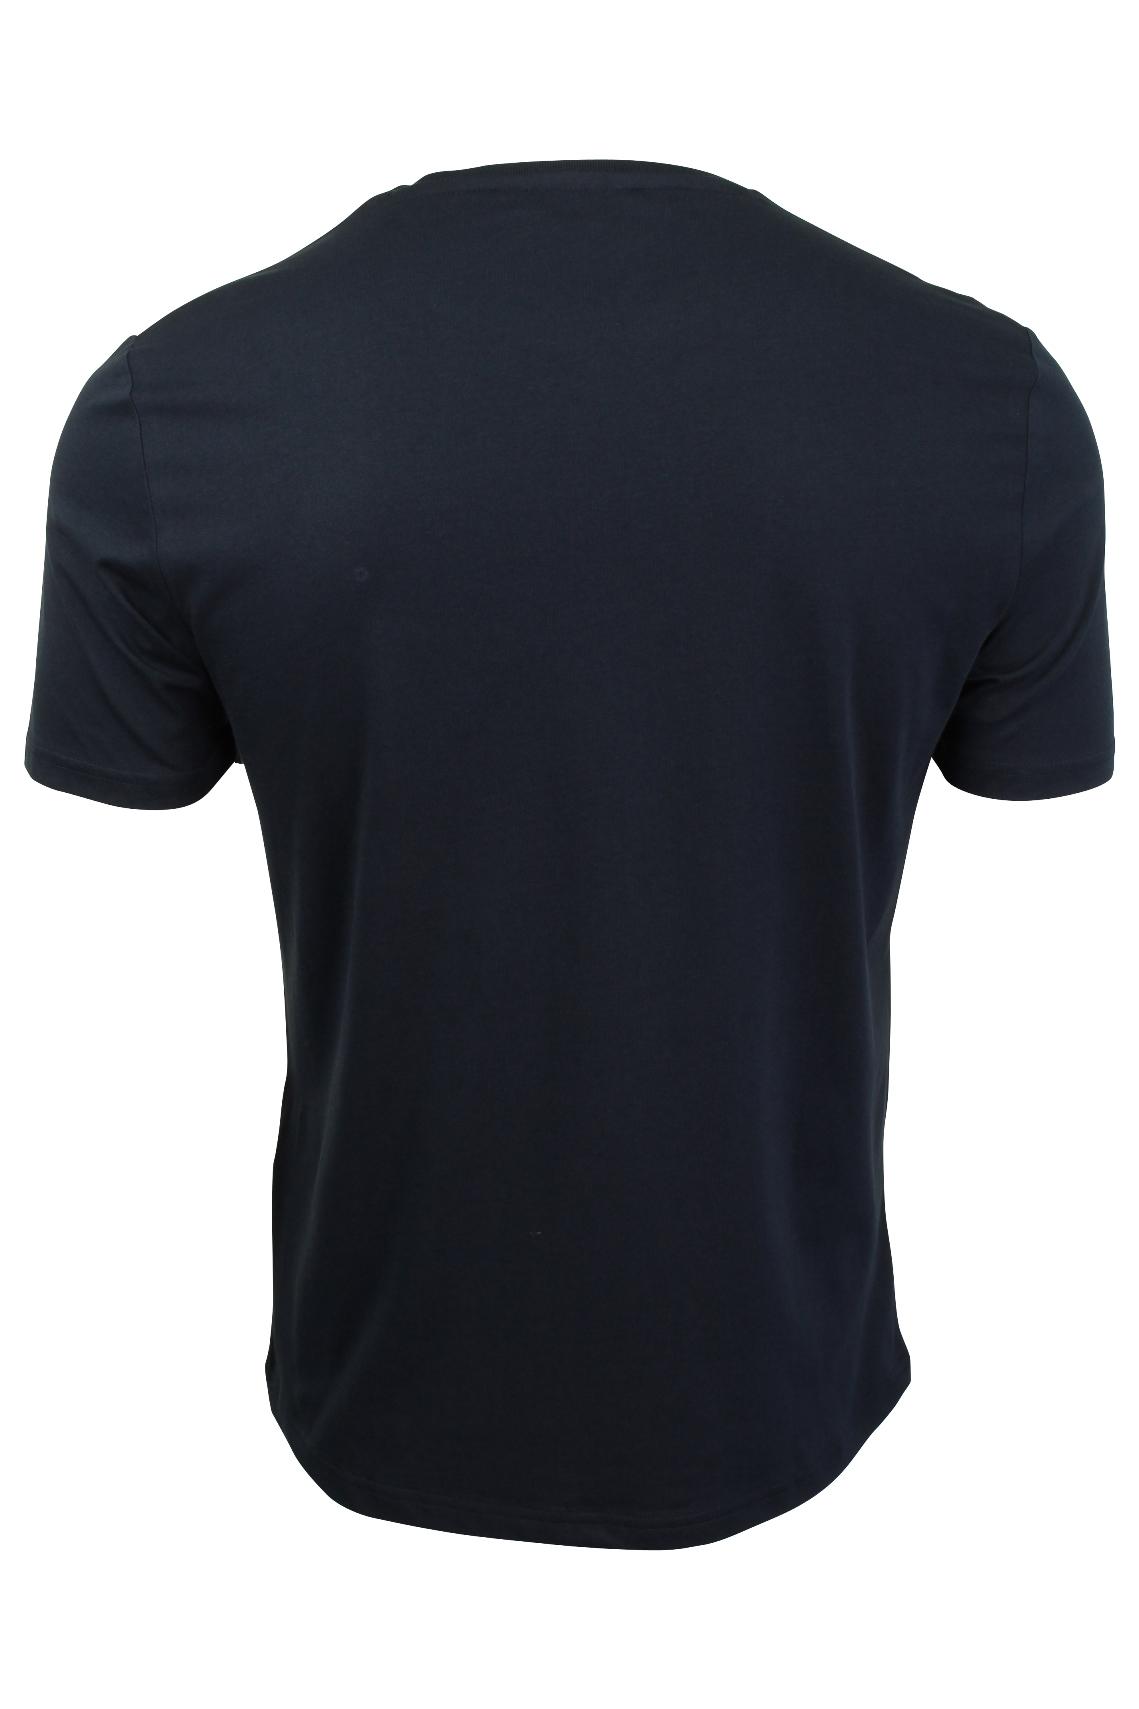 Mens-Classic-Spade-Pocket-T-Shirt-by-Ben-Sherman thumbnail 25